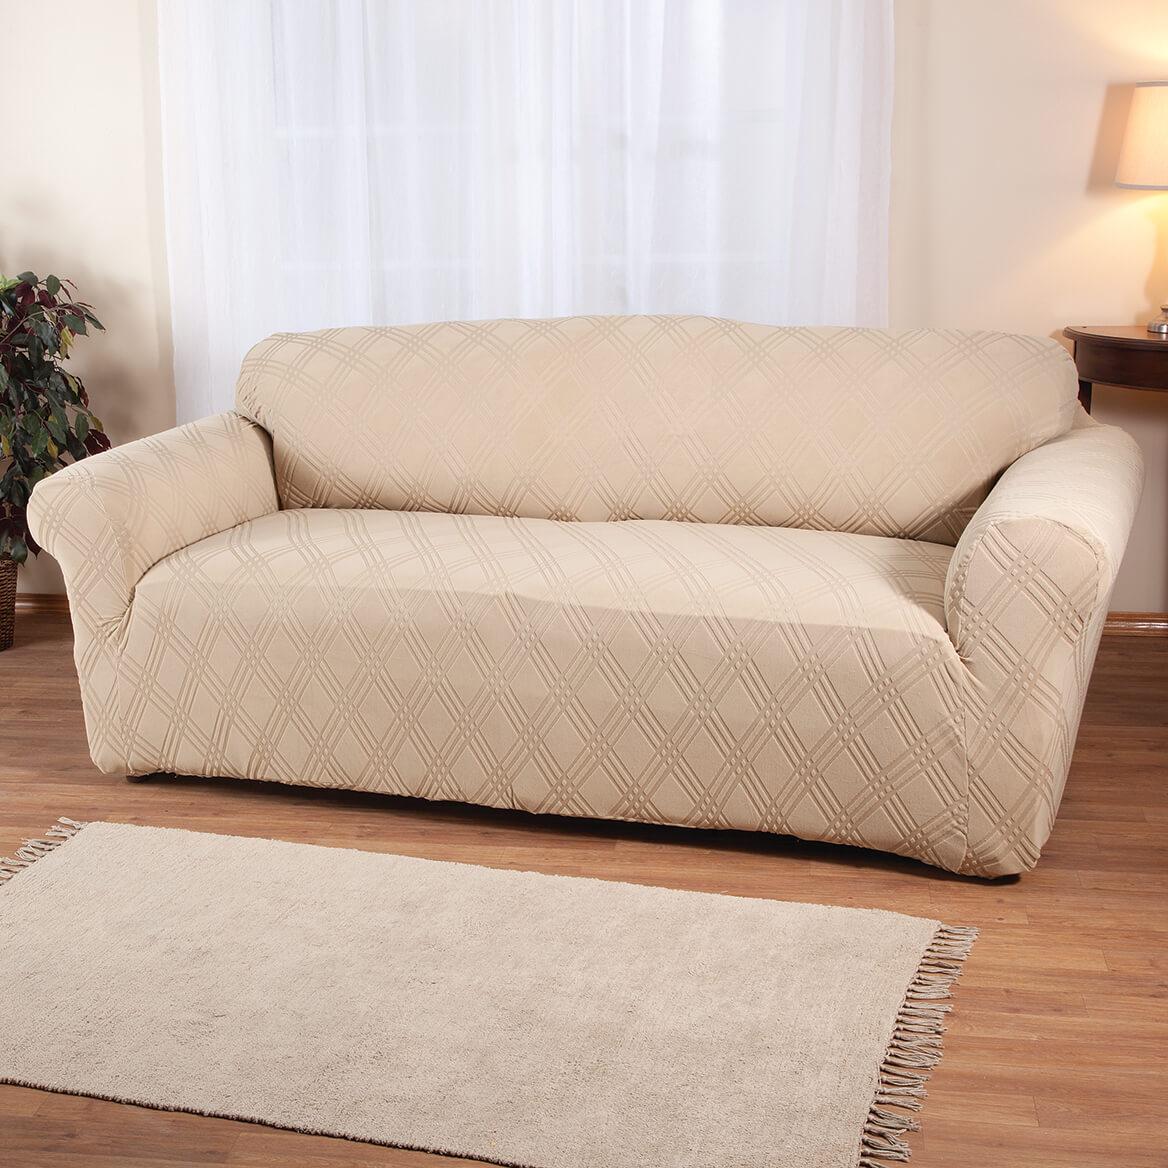 Double Diamond Stretch Sofa Cover